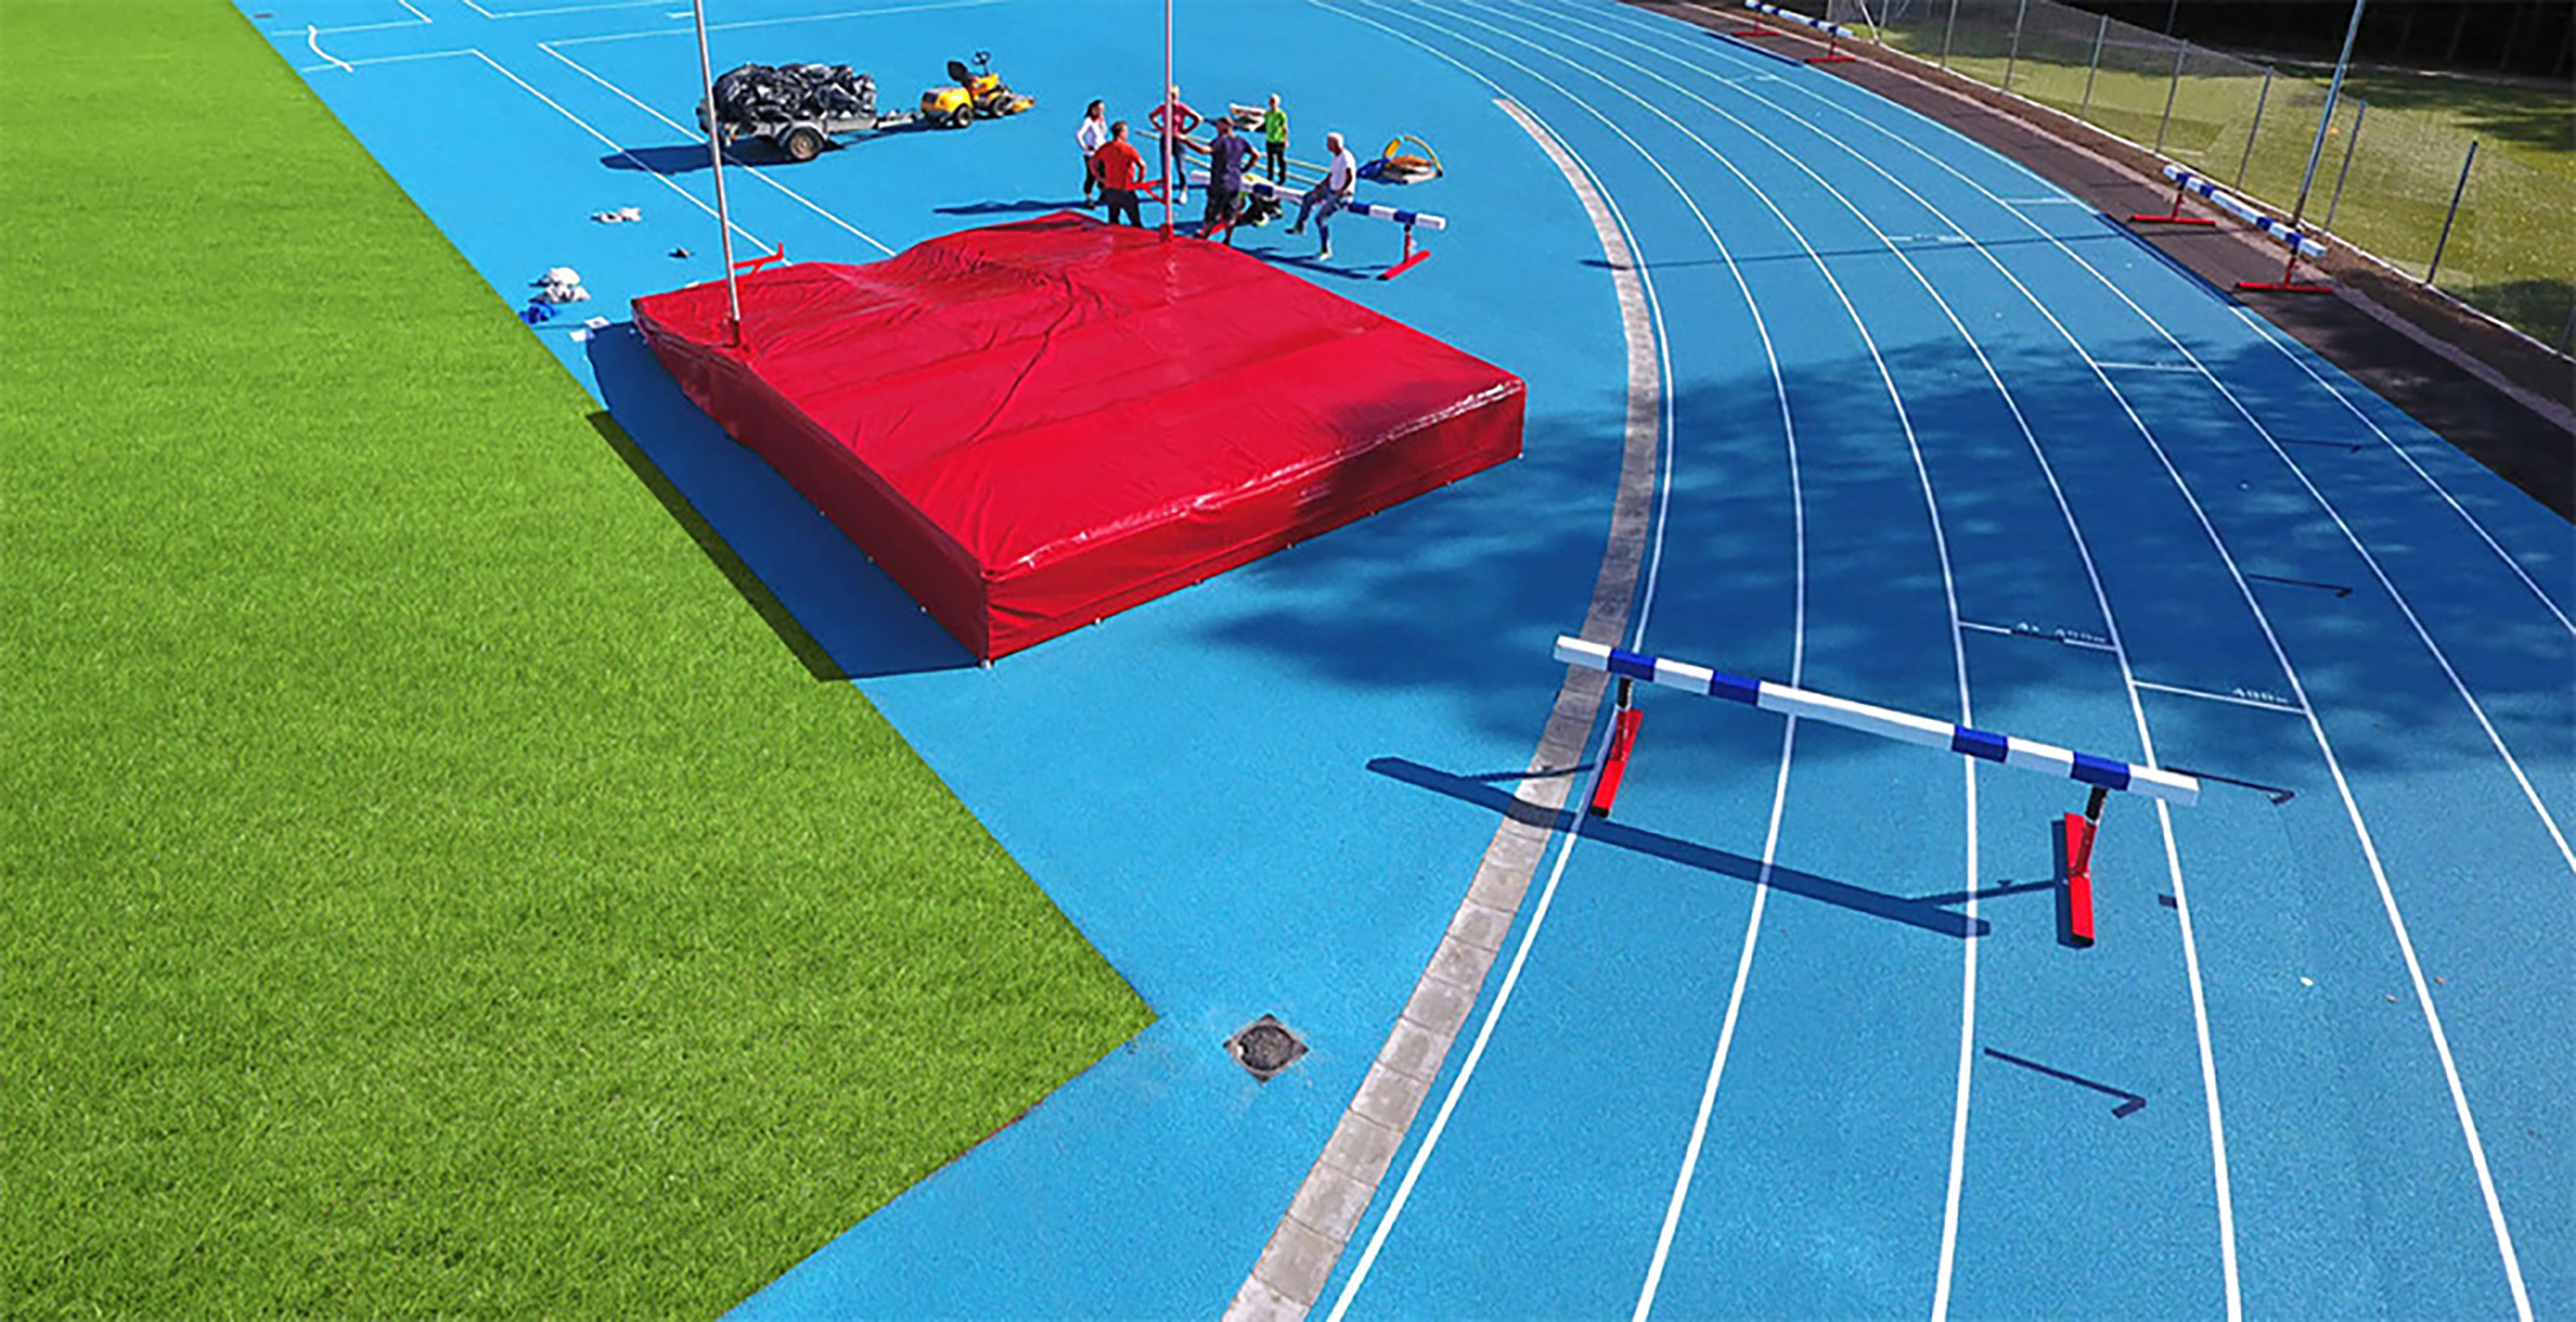 Atletik løbebane